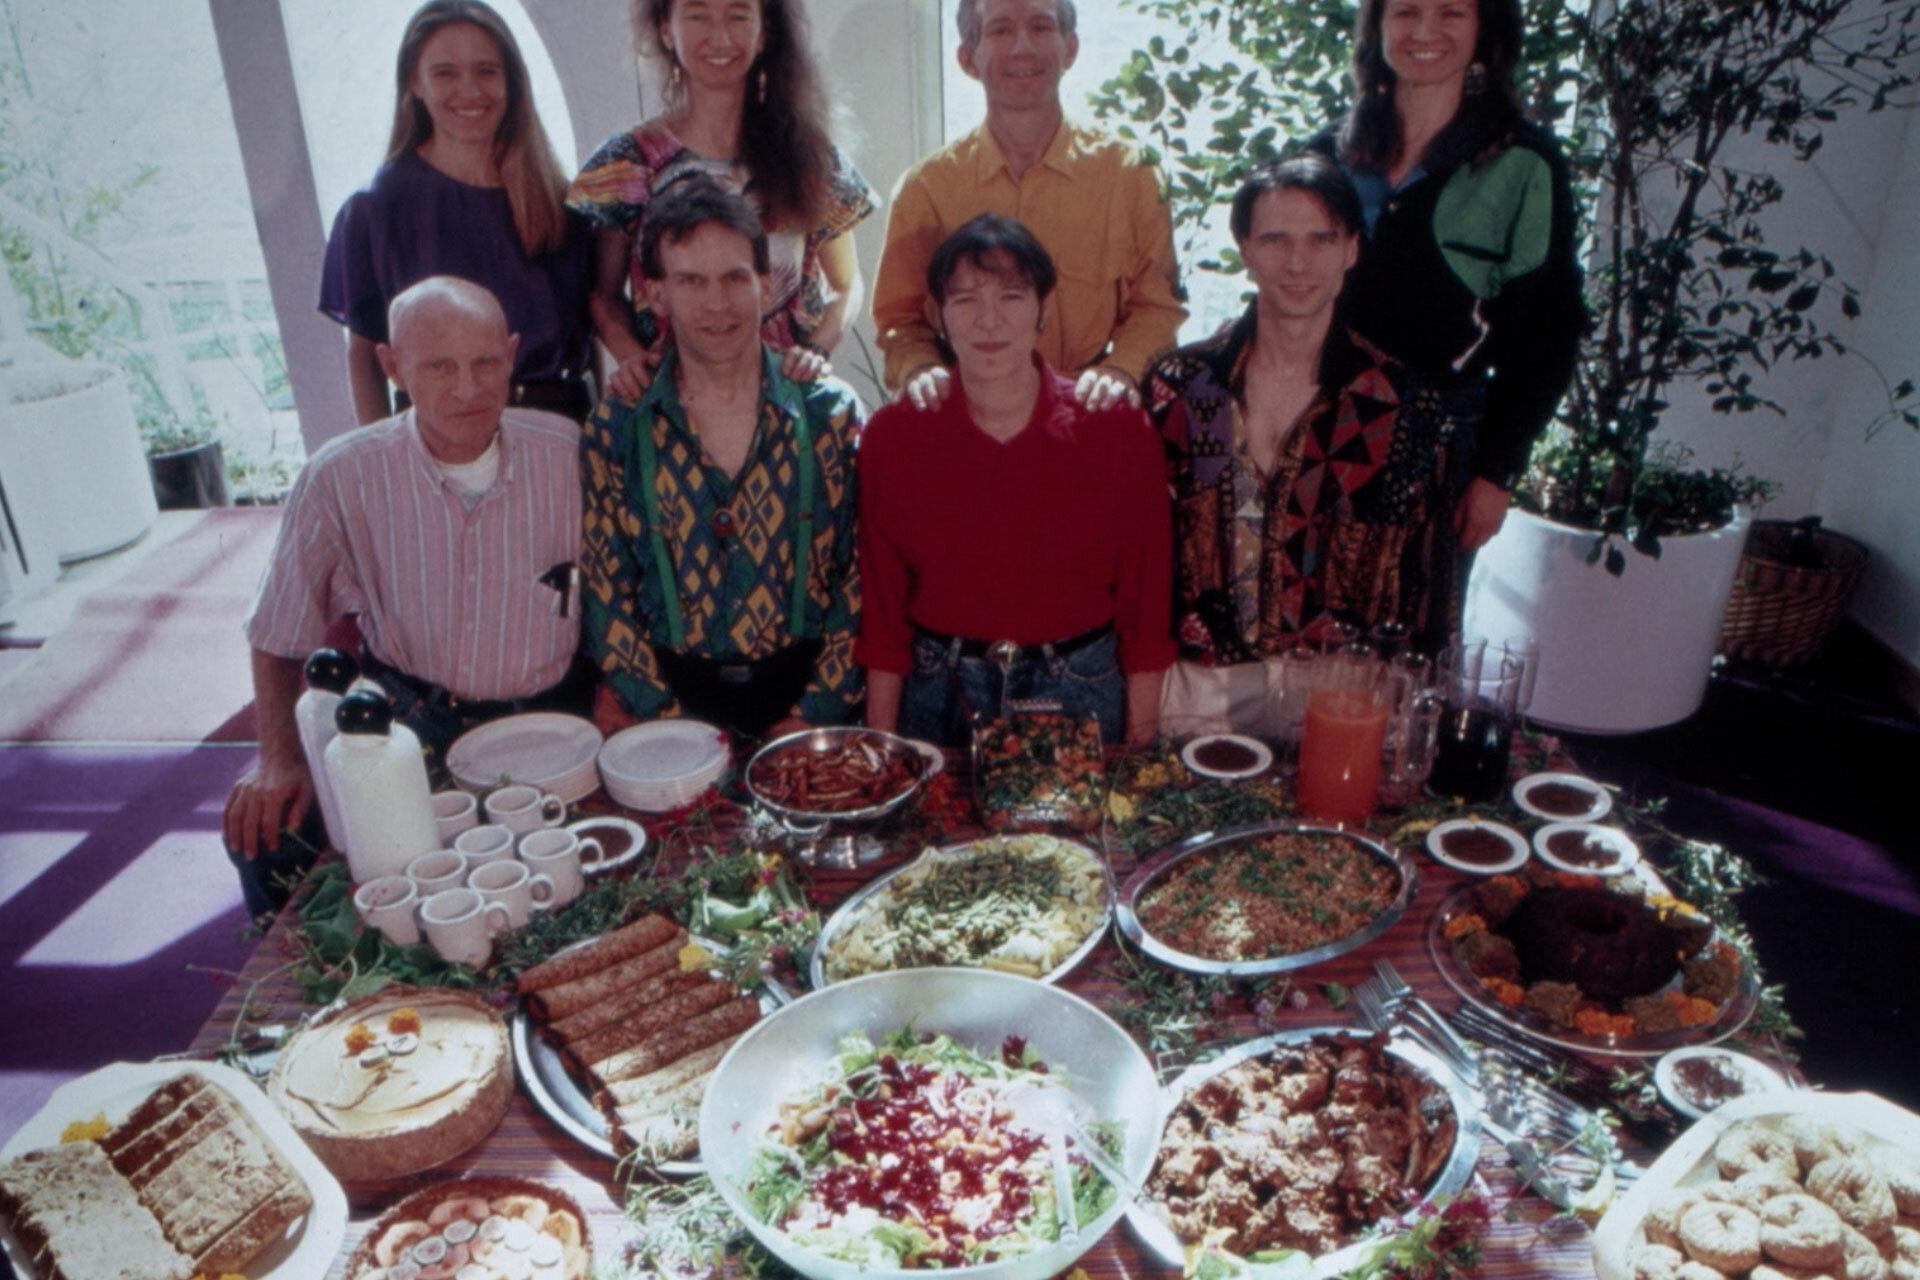 Biospherians enjoying a feast in the Biosphere 2